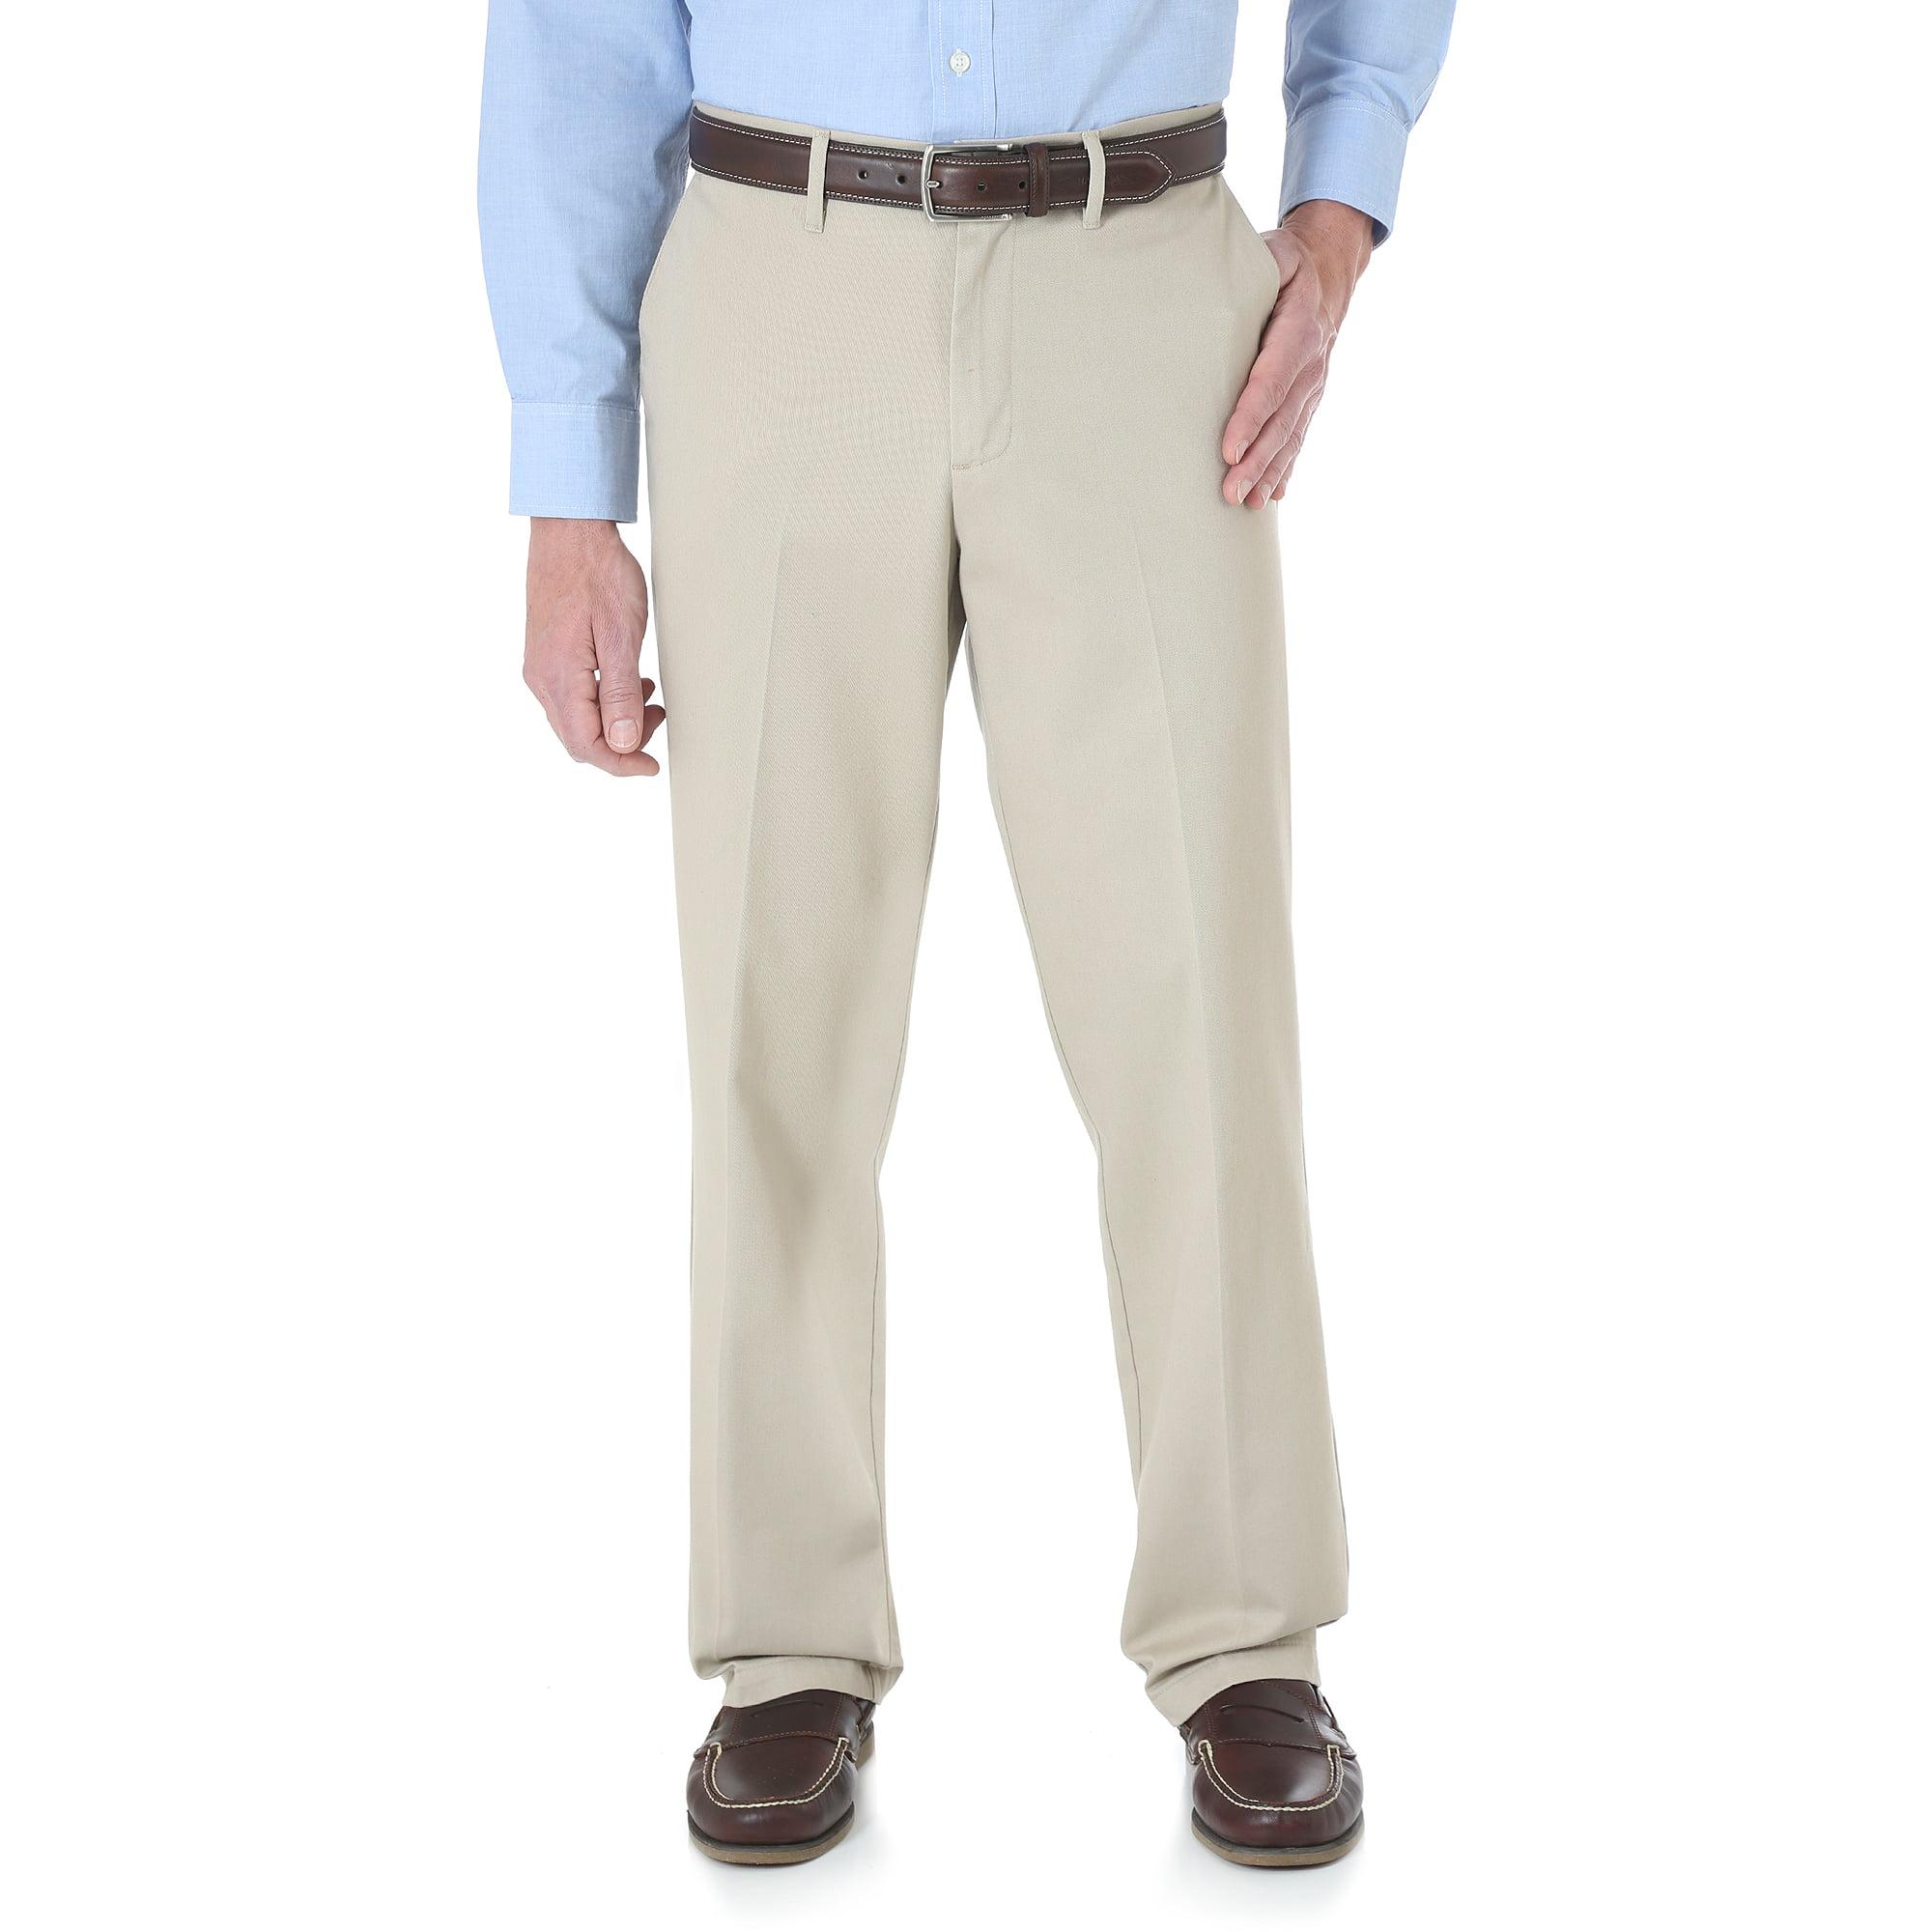 Wrangler Men's No Iron Flat Front Casual Pant - Walmart.com